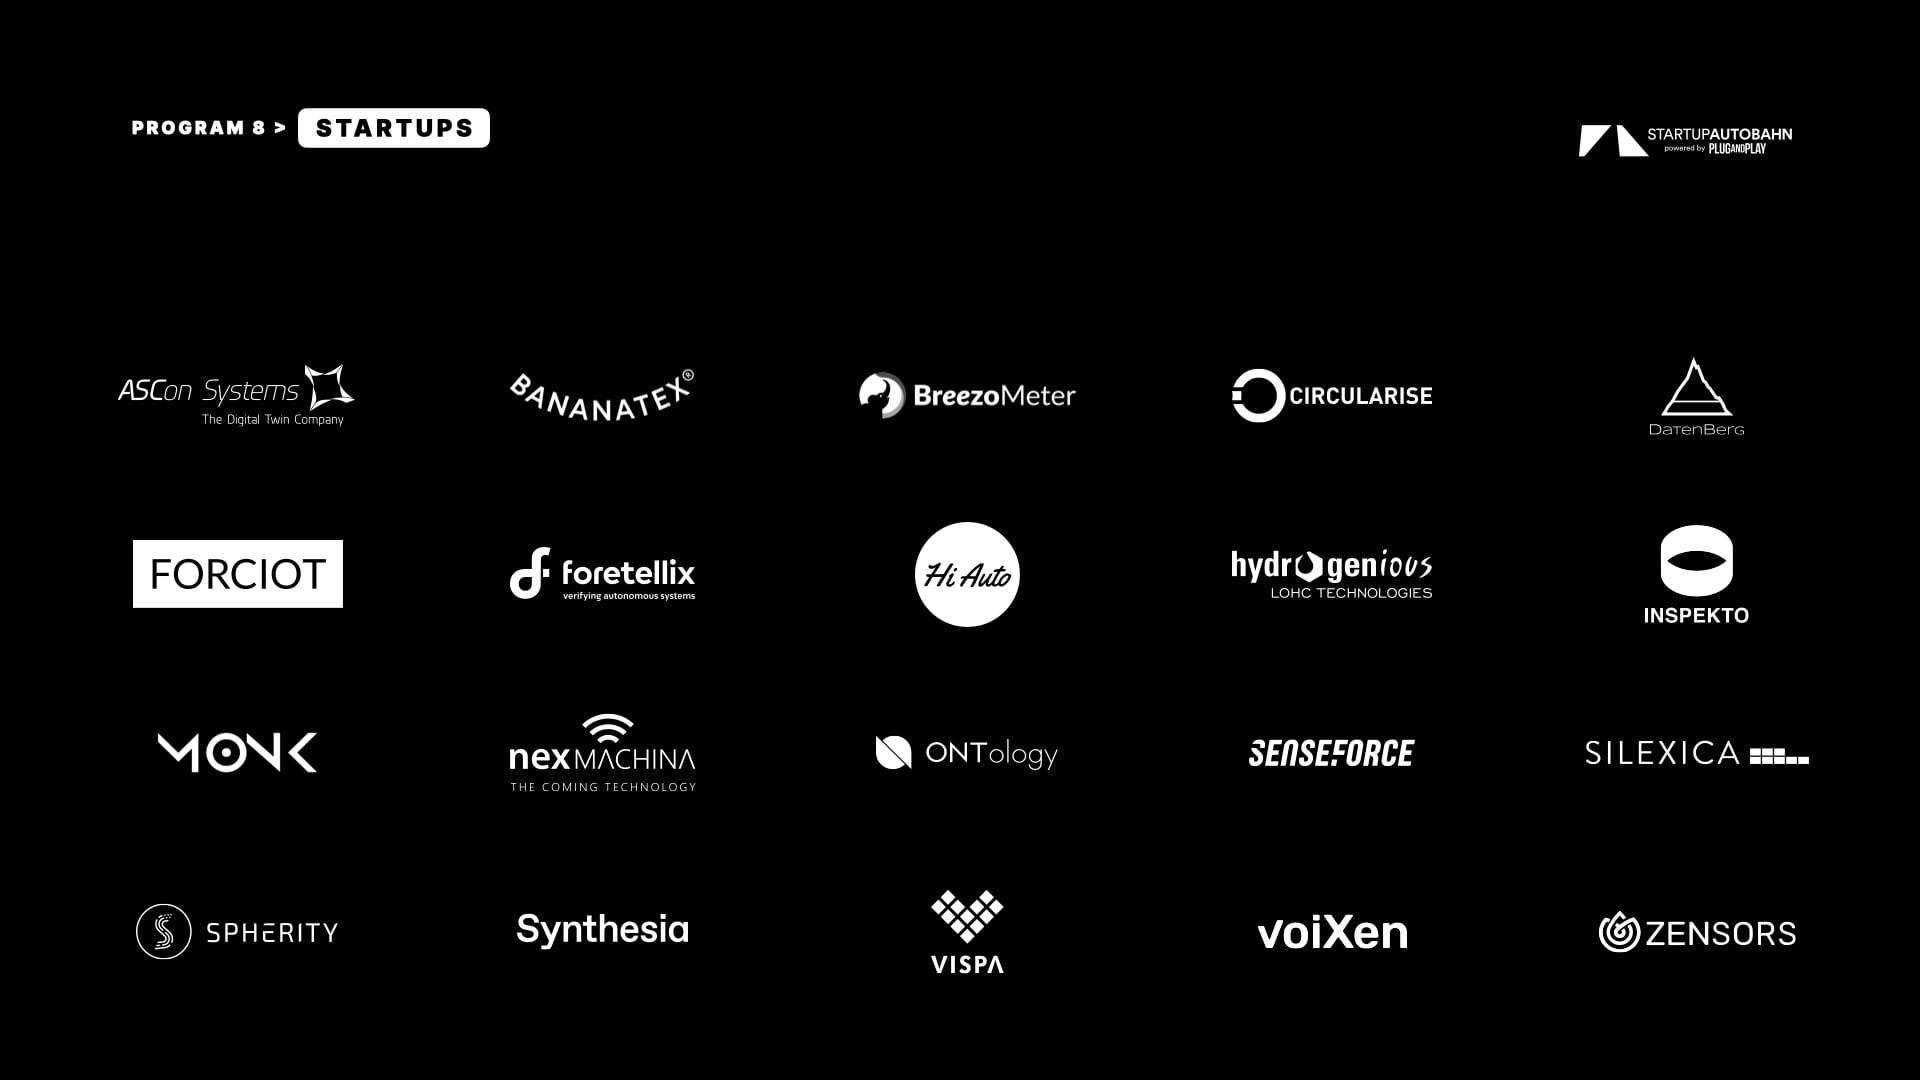 Daimler und ASCon Systems – Startup Autobahn EXPO 8